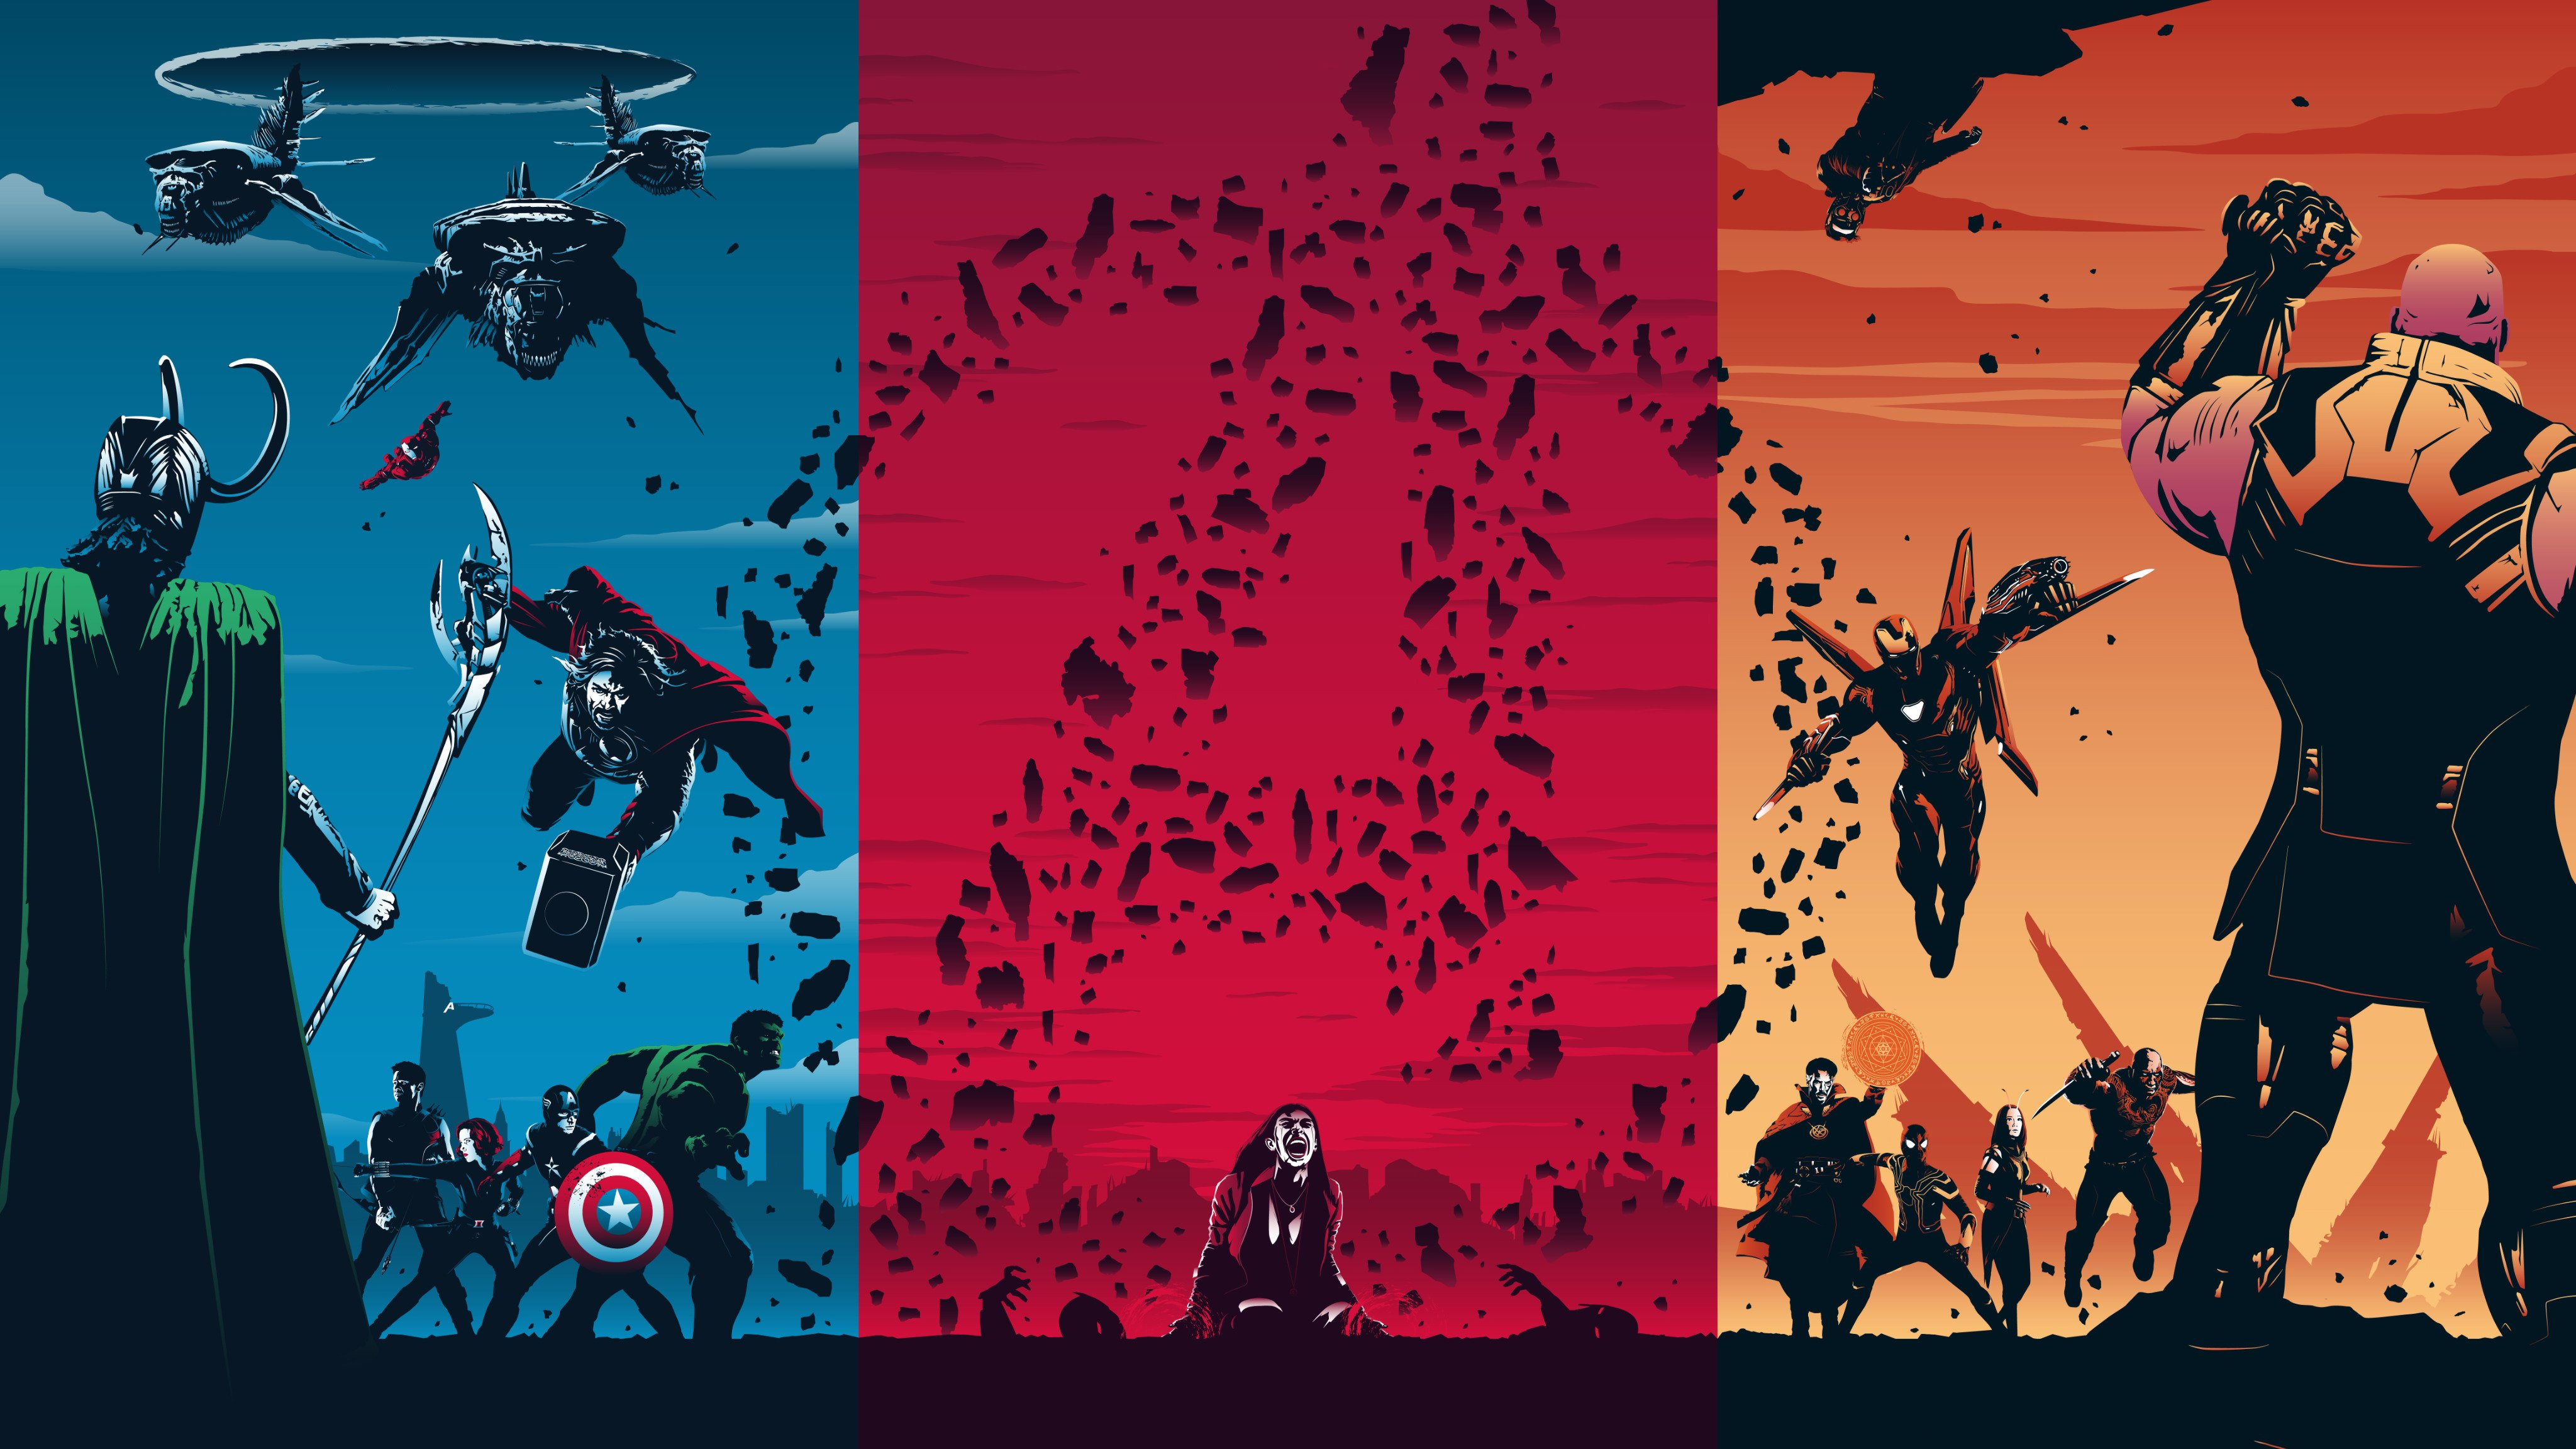 Black Widow Captain America Doctor Strange Drax The Destroyer Hawkeye Hulk Iron Man Loki Mantis Marv Wallpaper Resolution 4096x2304 Id 1079604 Wallha Com